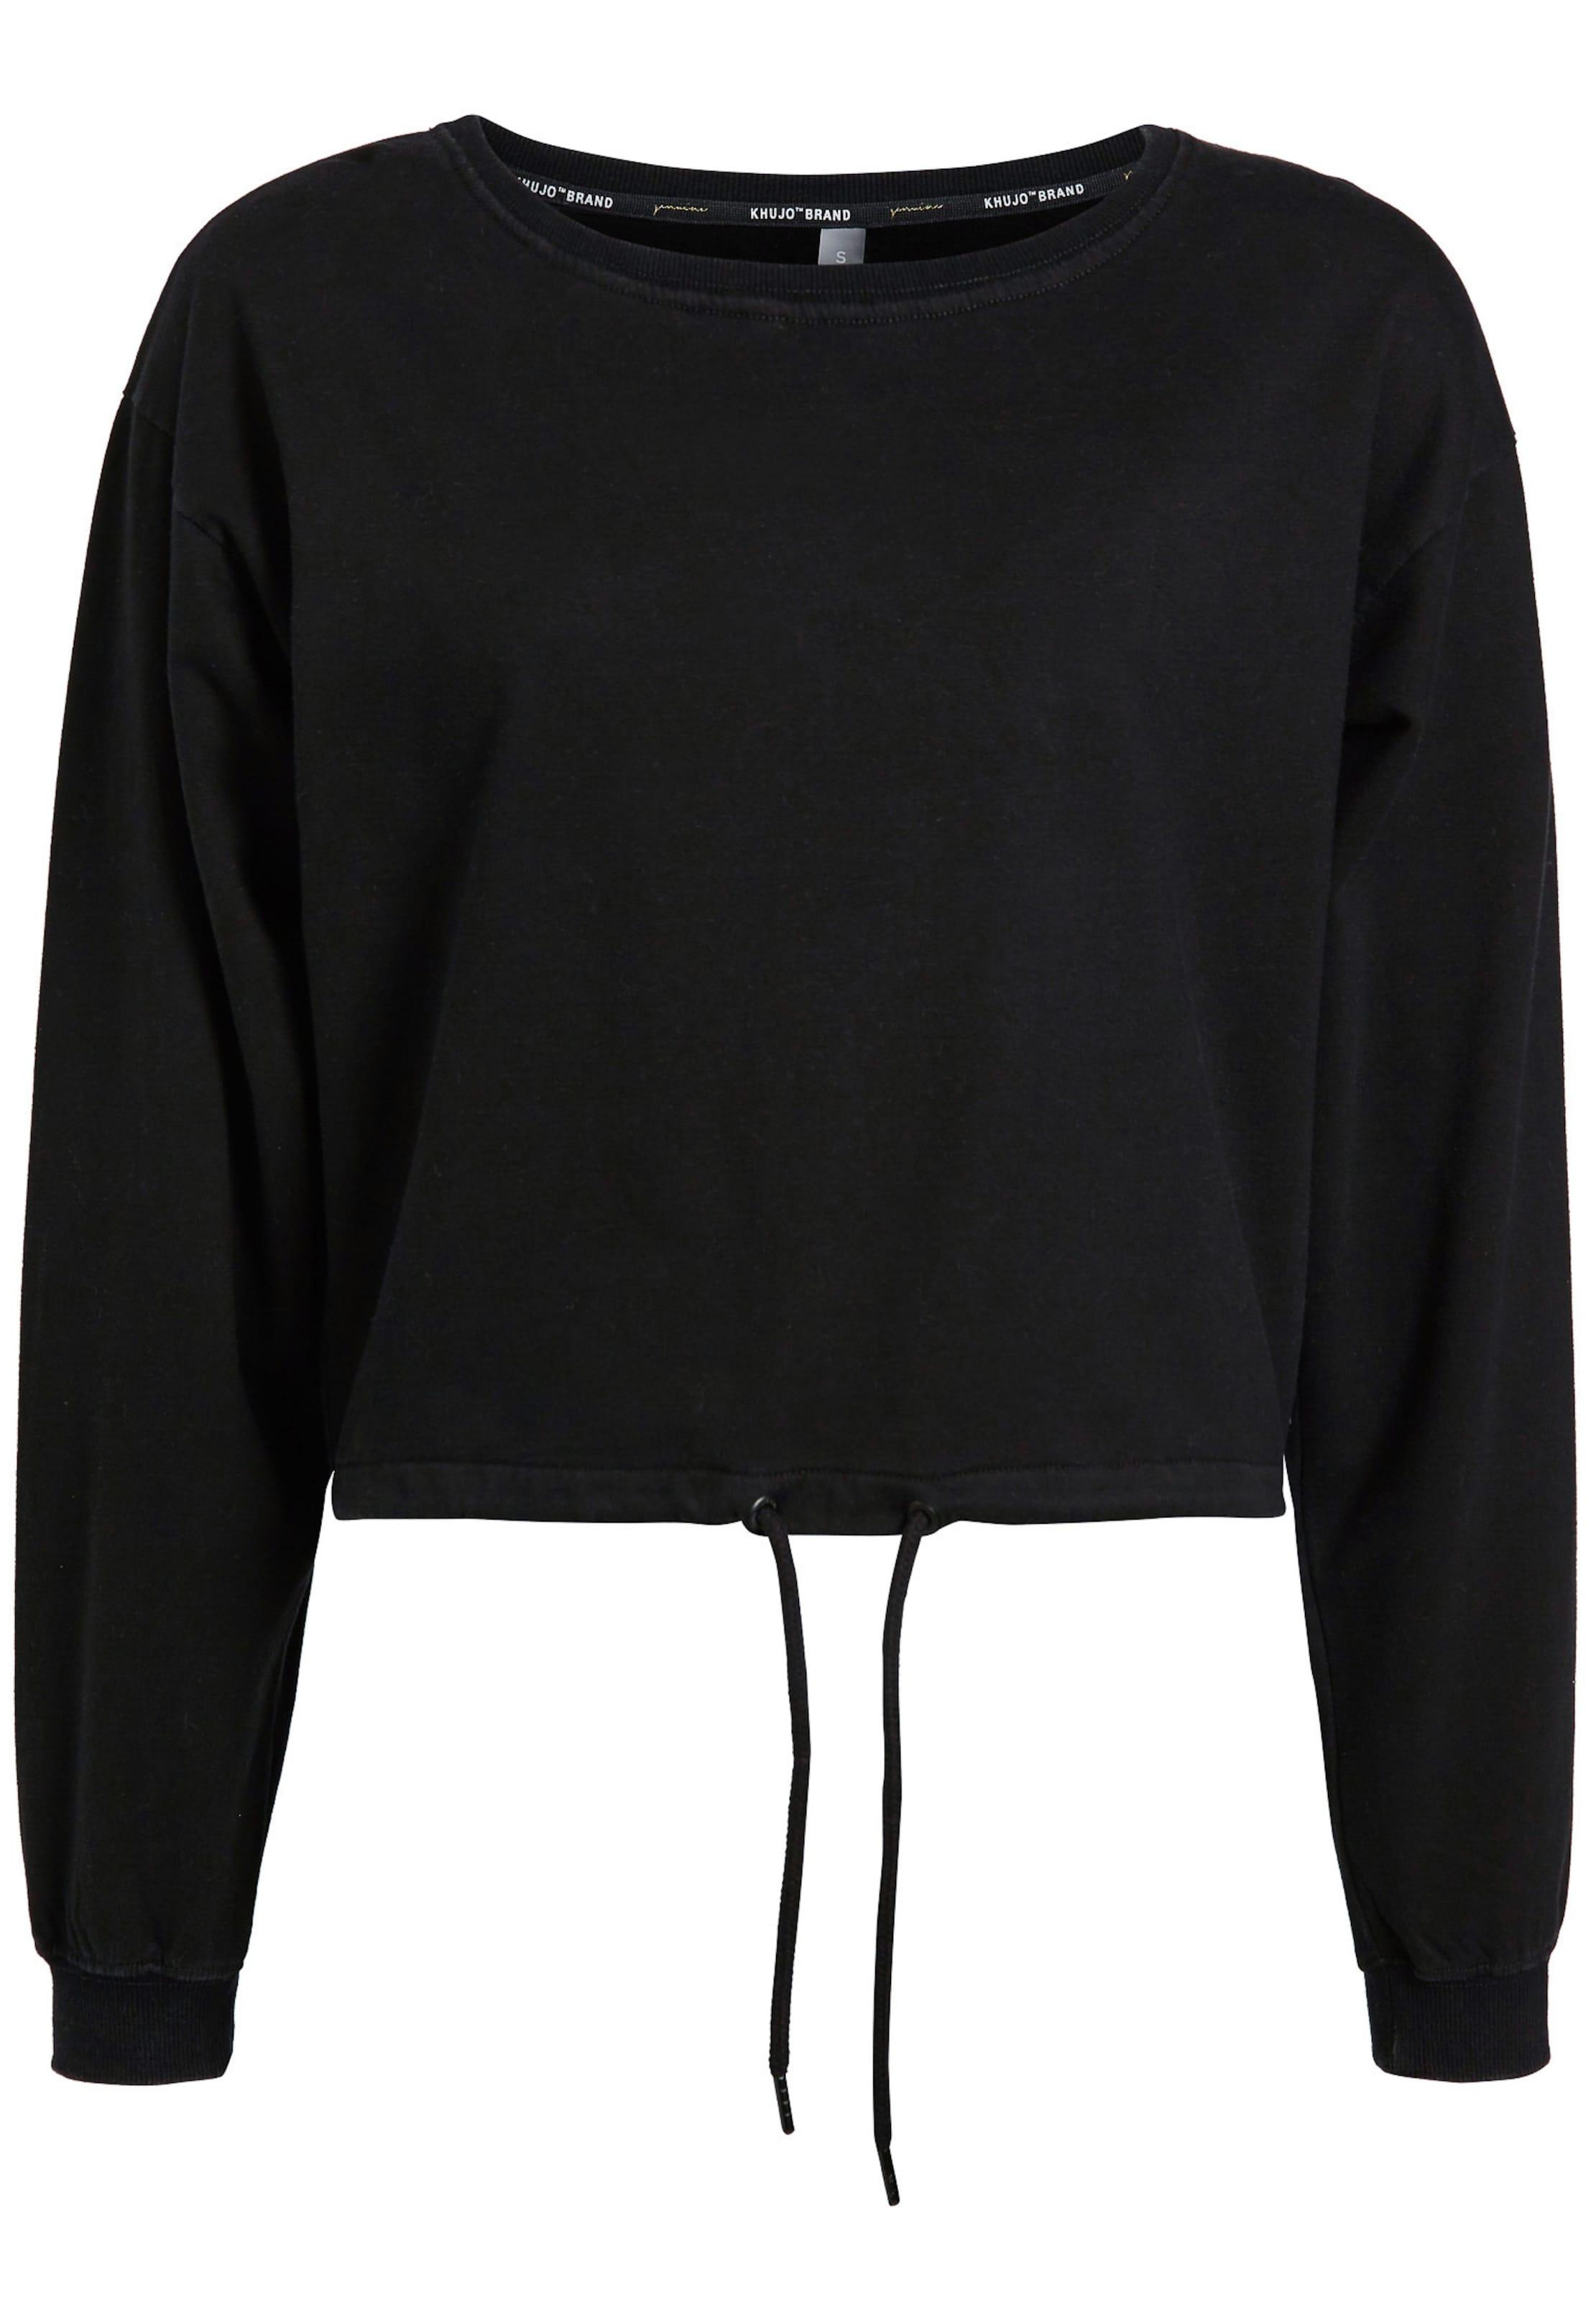 Sweatshirt LichtgrijsZwart 'alina' 'alina' In Sweatshirt Khujo Khujo T13FKJluc